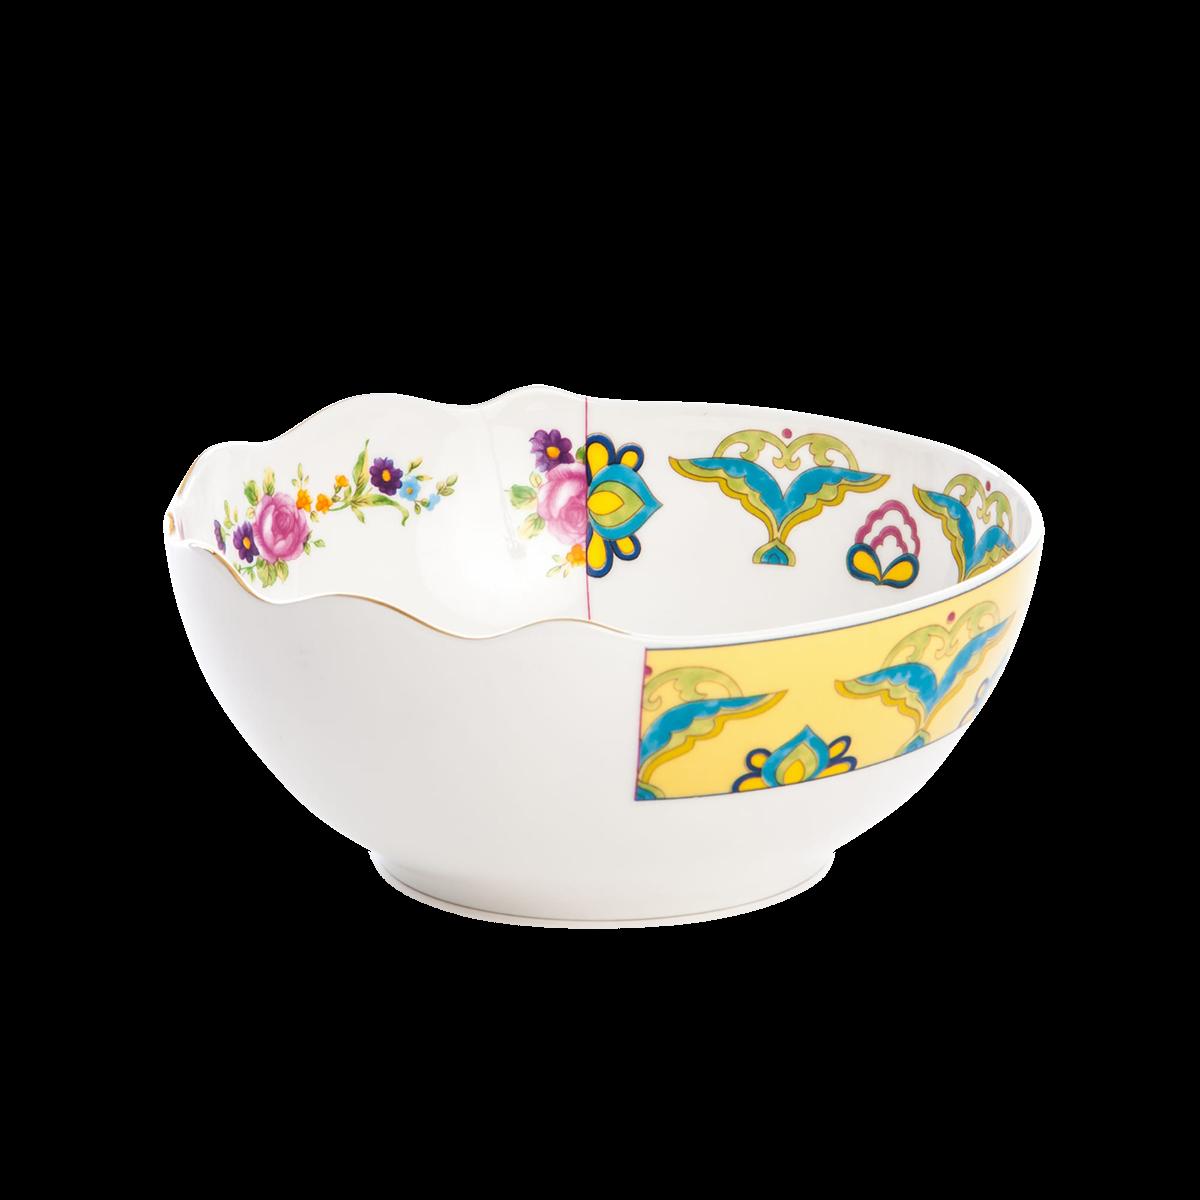 Seletti Hybrid Collection, Bauci Bowl-0